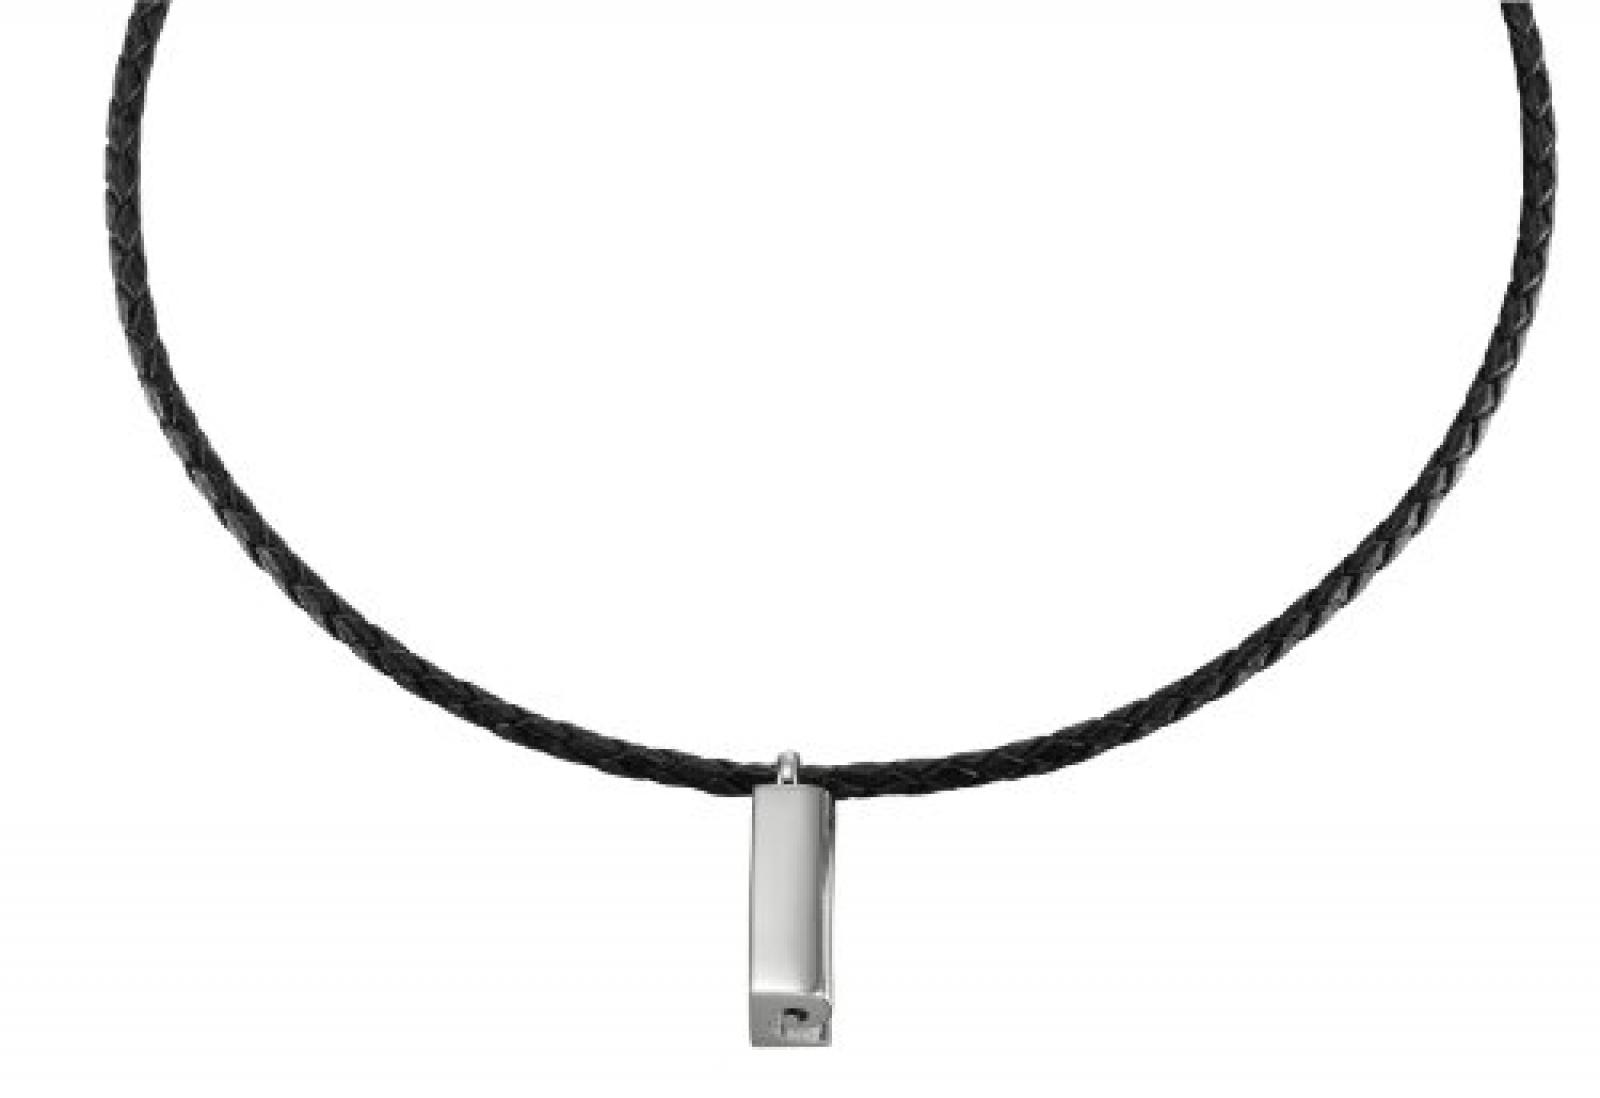 Pierre Cardin Unisex-Halsschmuck Bâton Sterling-Silber 925 50 Cm PCNL-90406.A.50